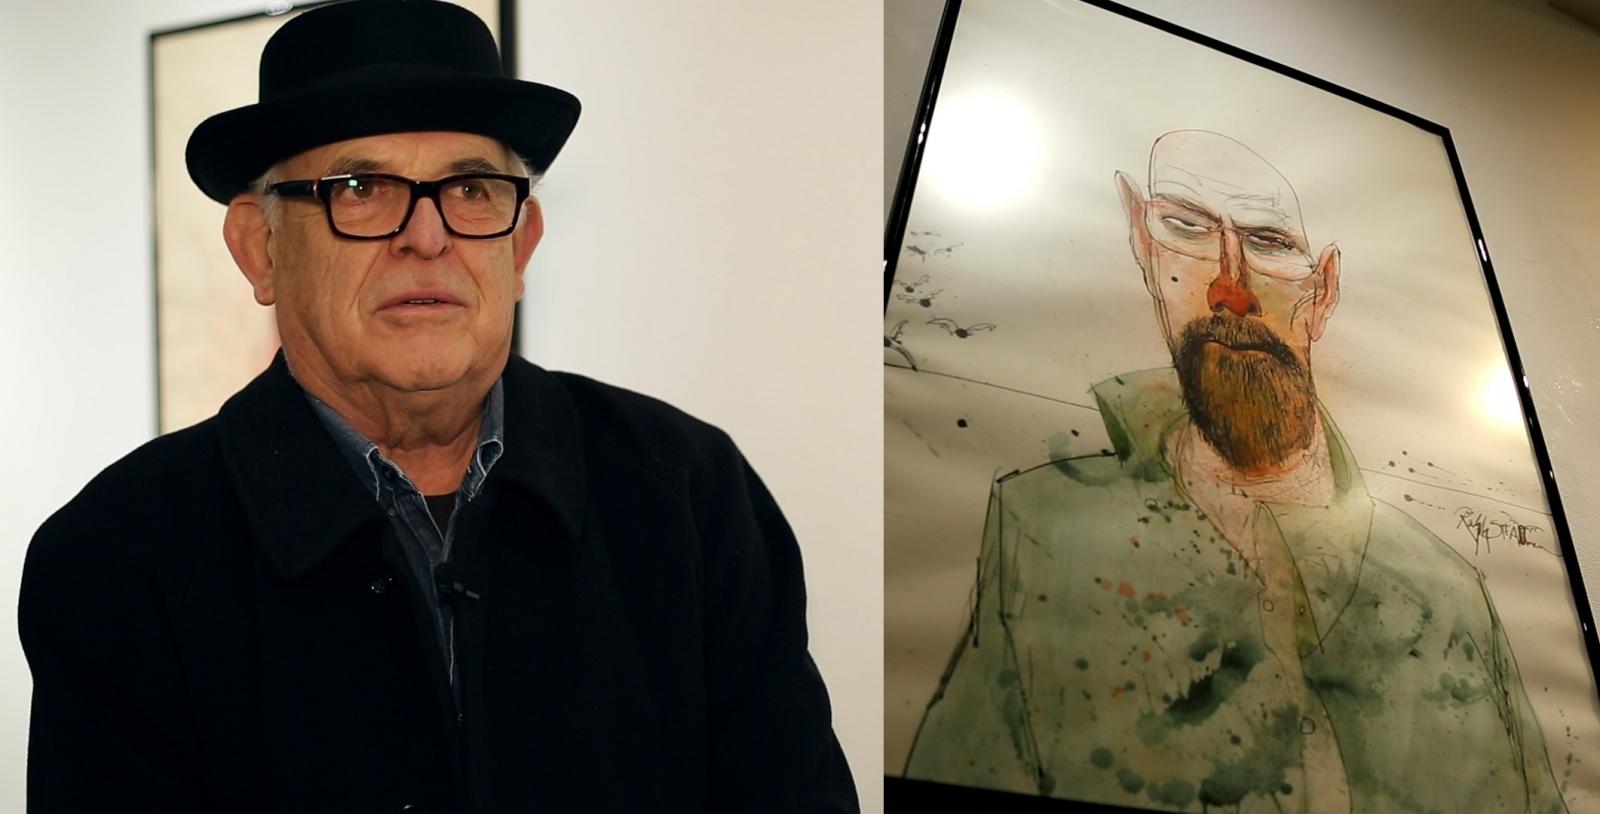 Breaking Bad: Ralph Steadman art exhibition of cult TV series opens in London